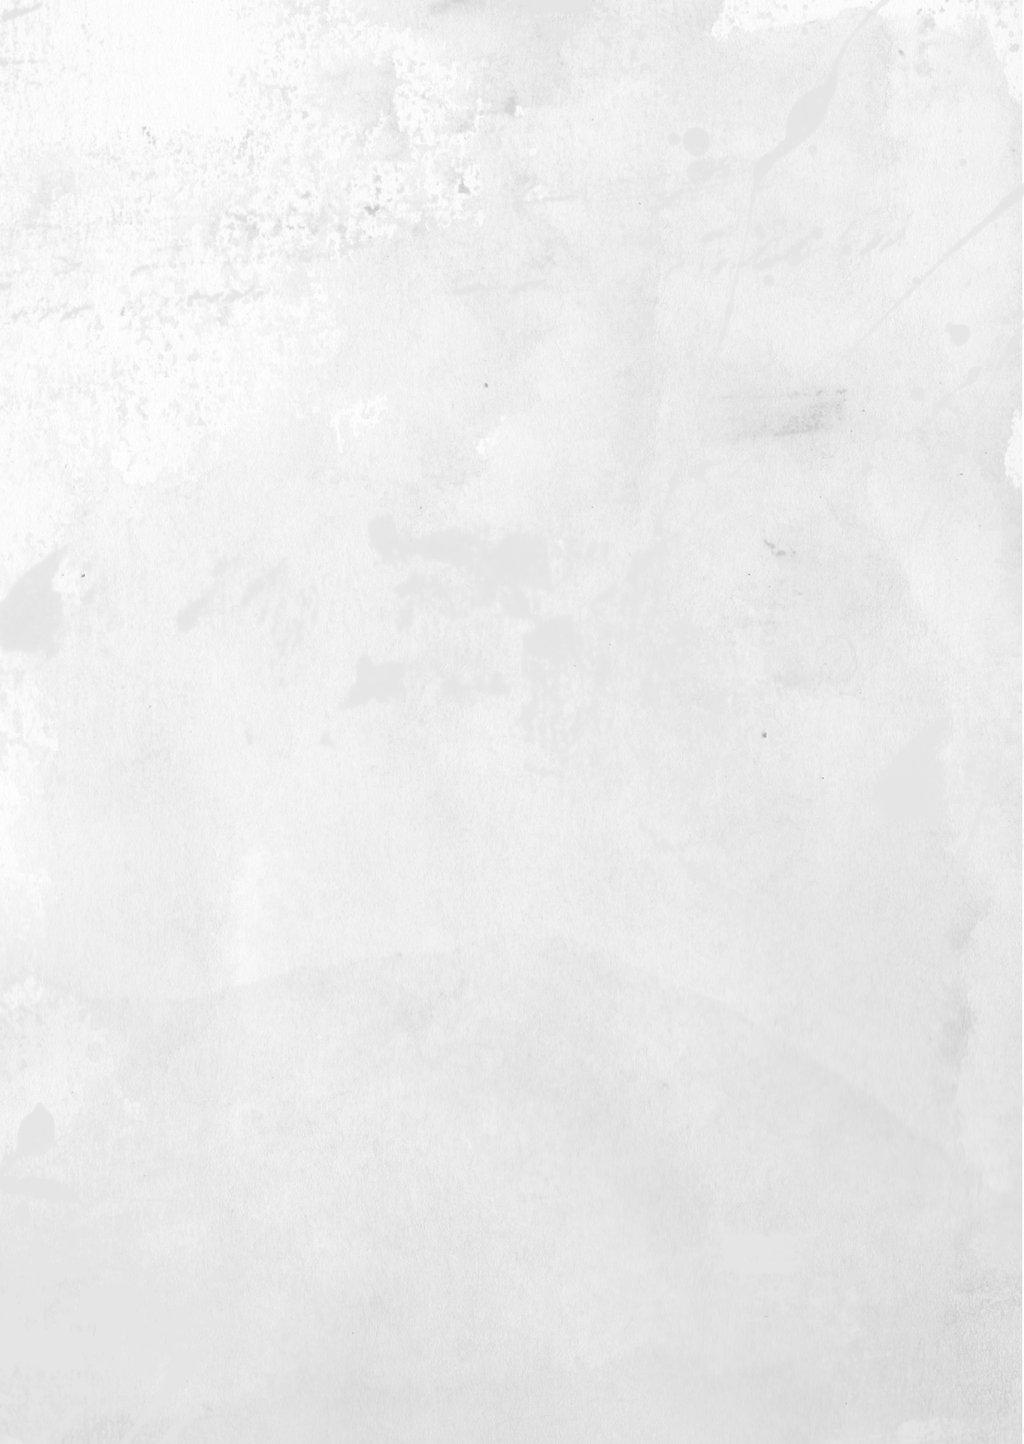 Soft Grunge Tumblr Background Tumblr soft grunge backgrounds 1024x1444